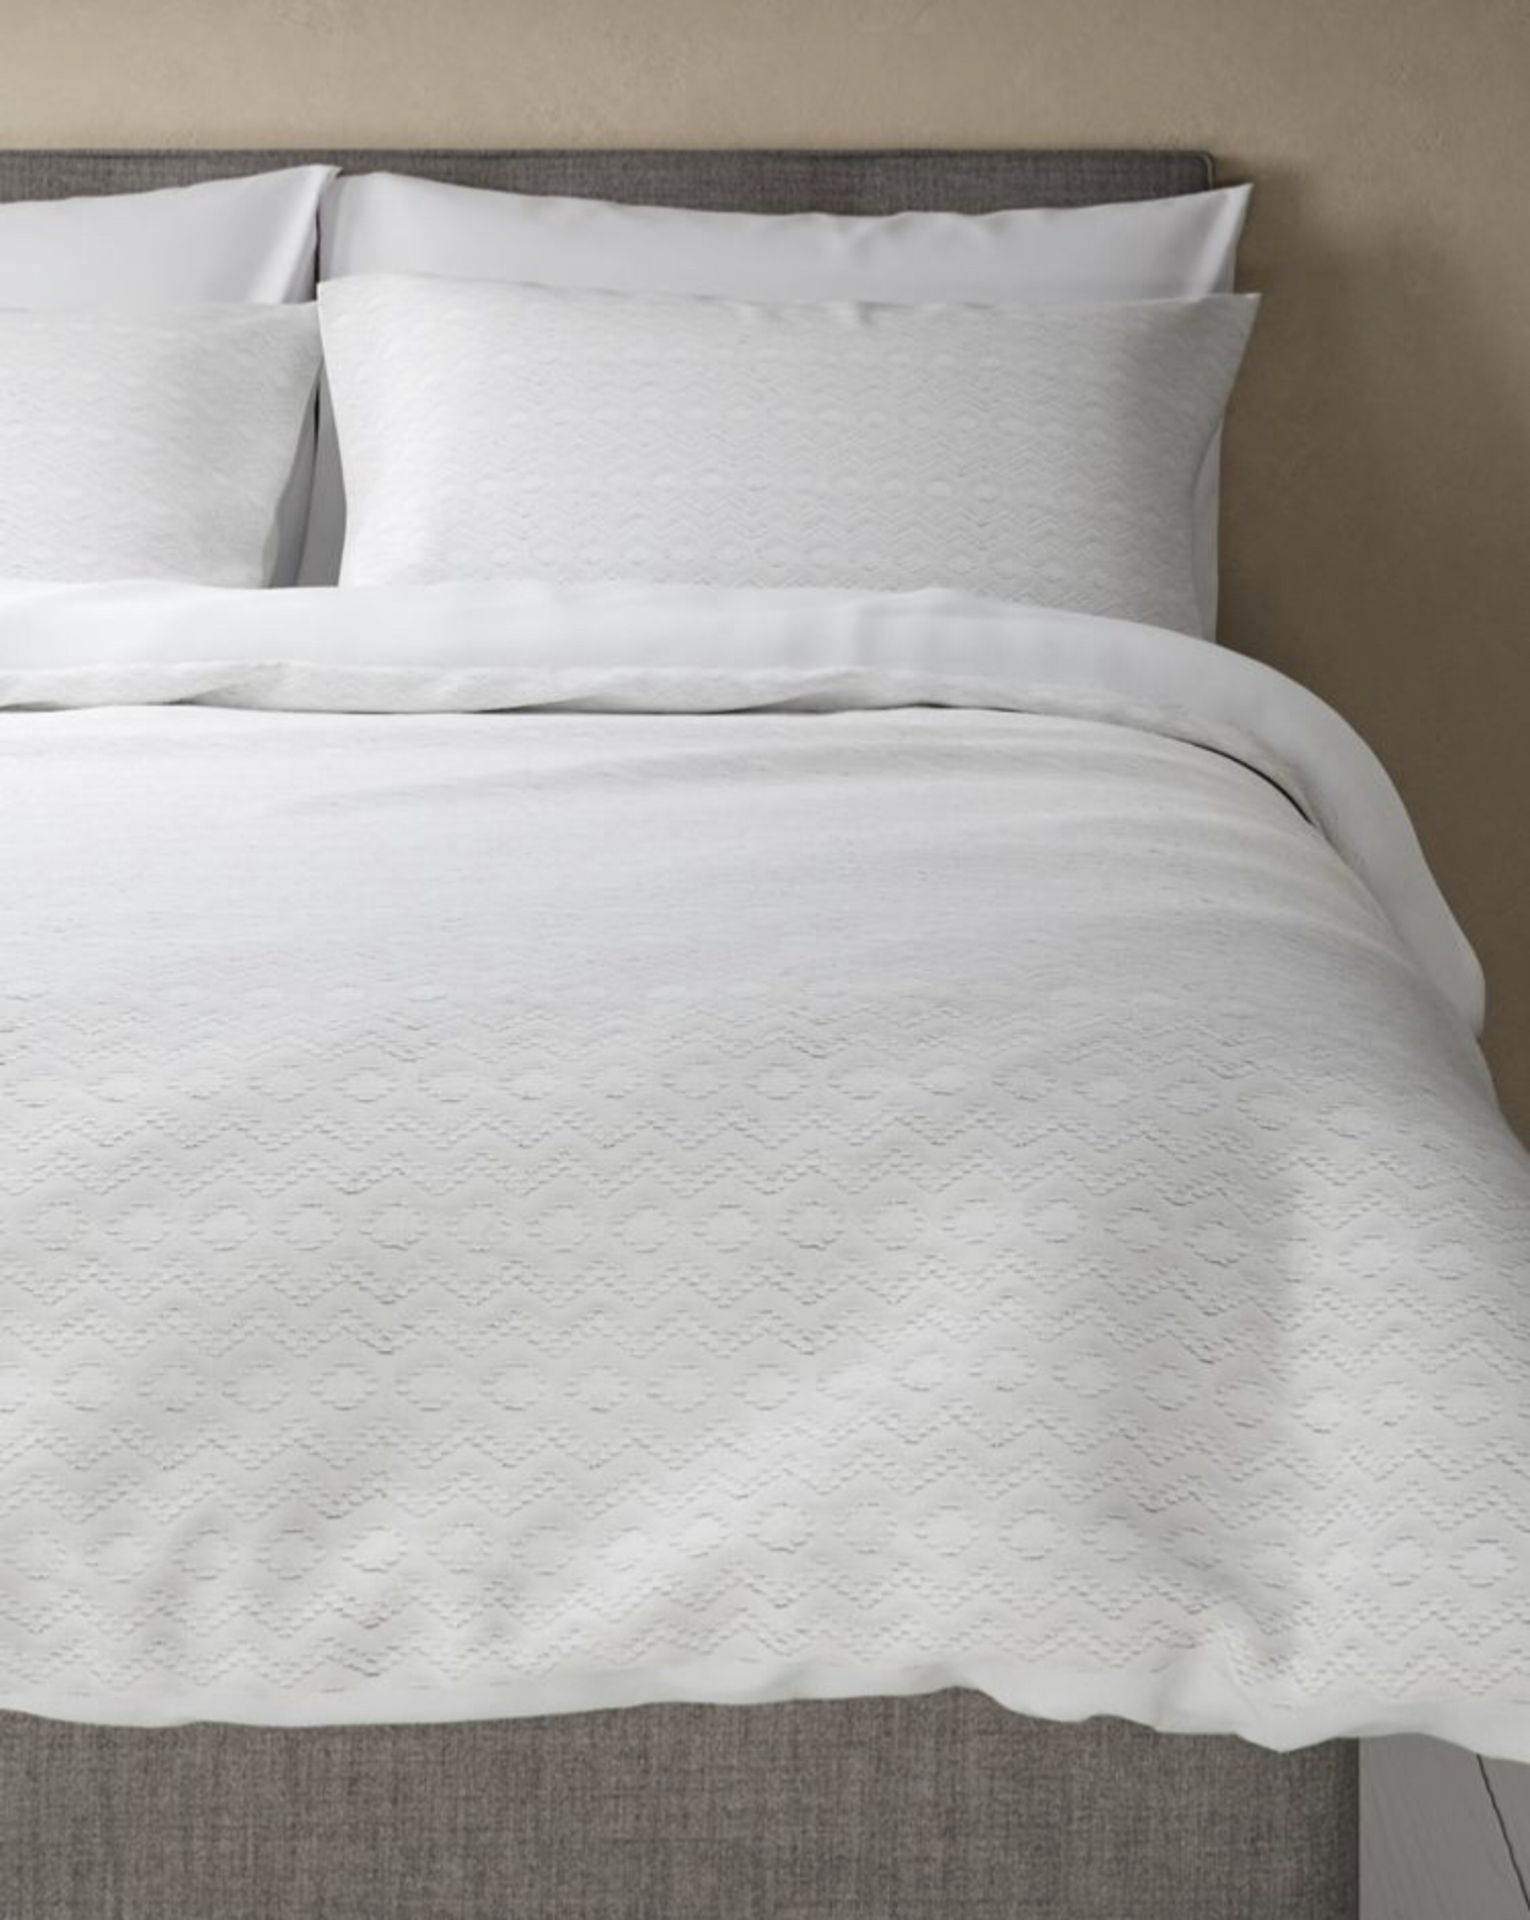 Lot 58 - Pure Cotton Zig Zag Textured Bedding Set, Super King